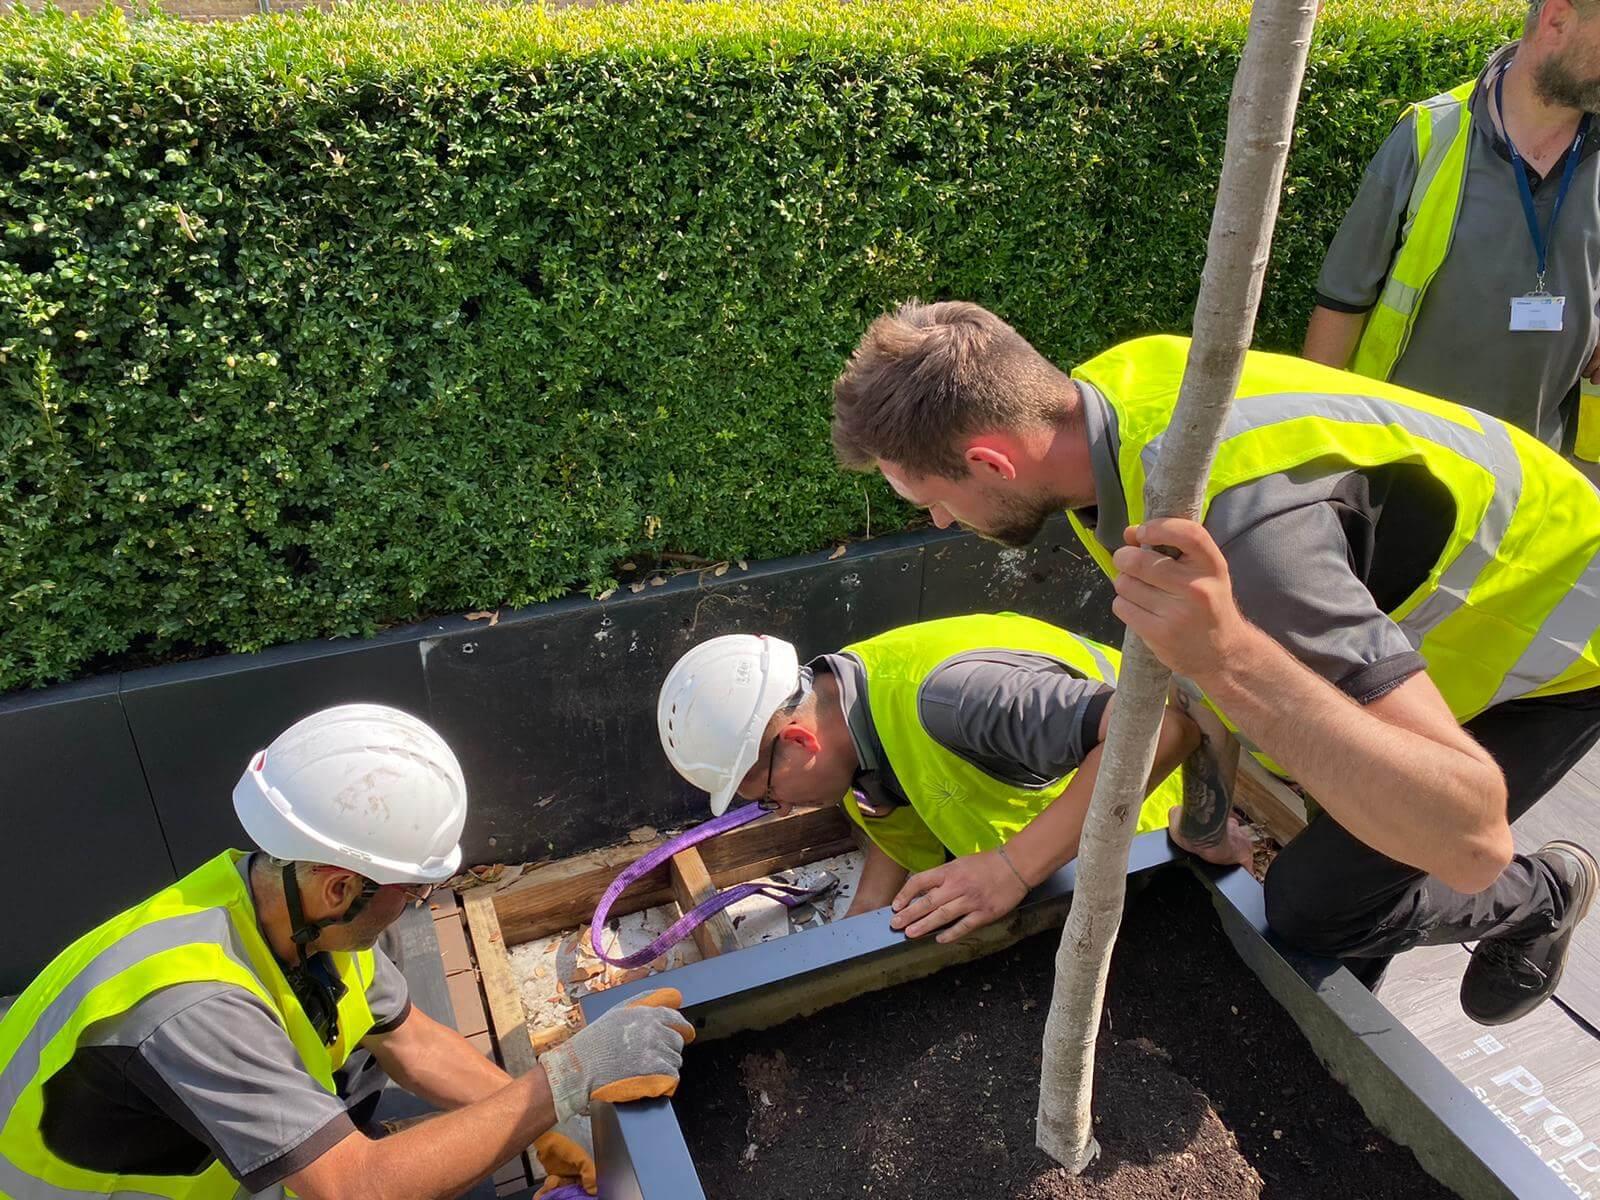 men working with yellow vests